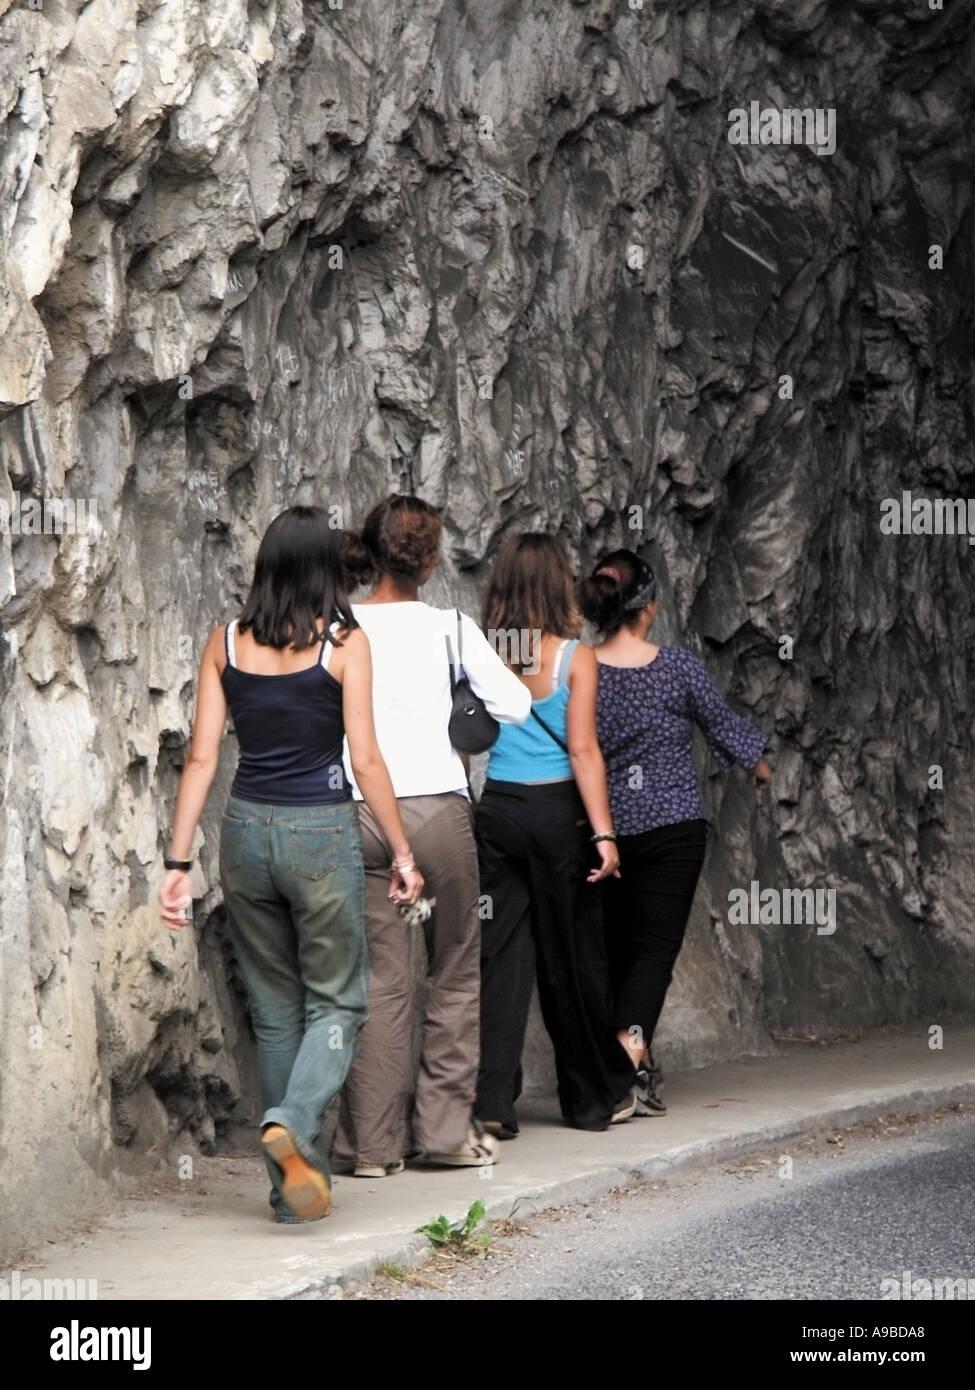 france four teenage girls walking along pavement through tunnel - Stock Image